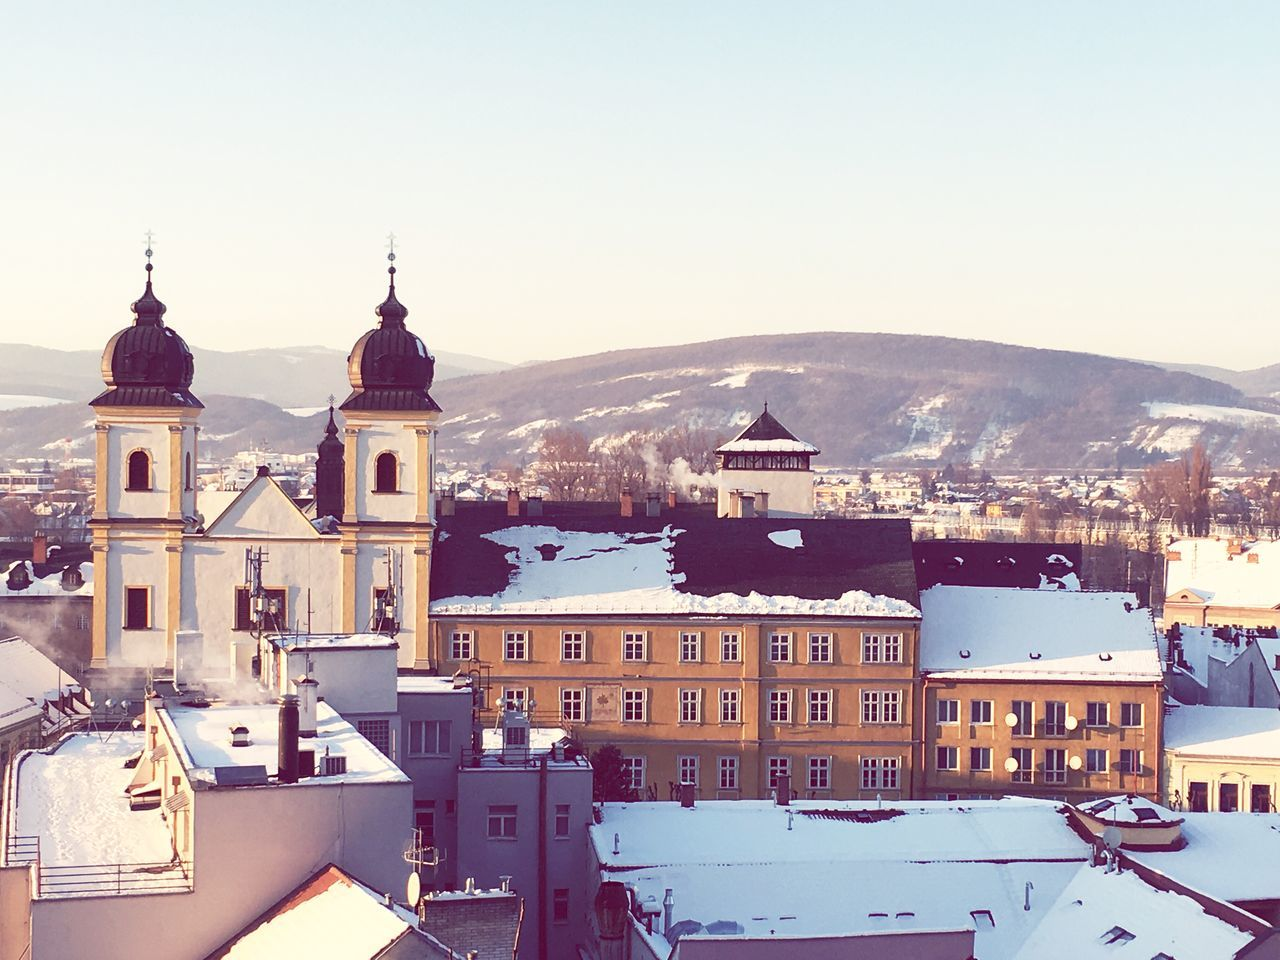 Snow,winter,town First Eyeem Photo